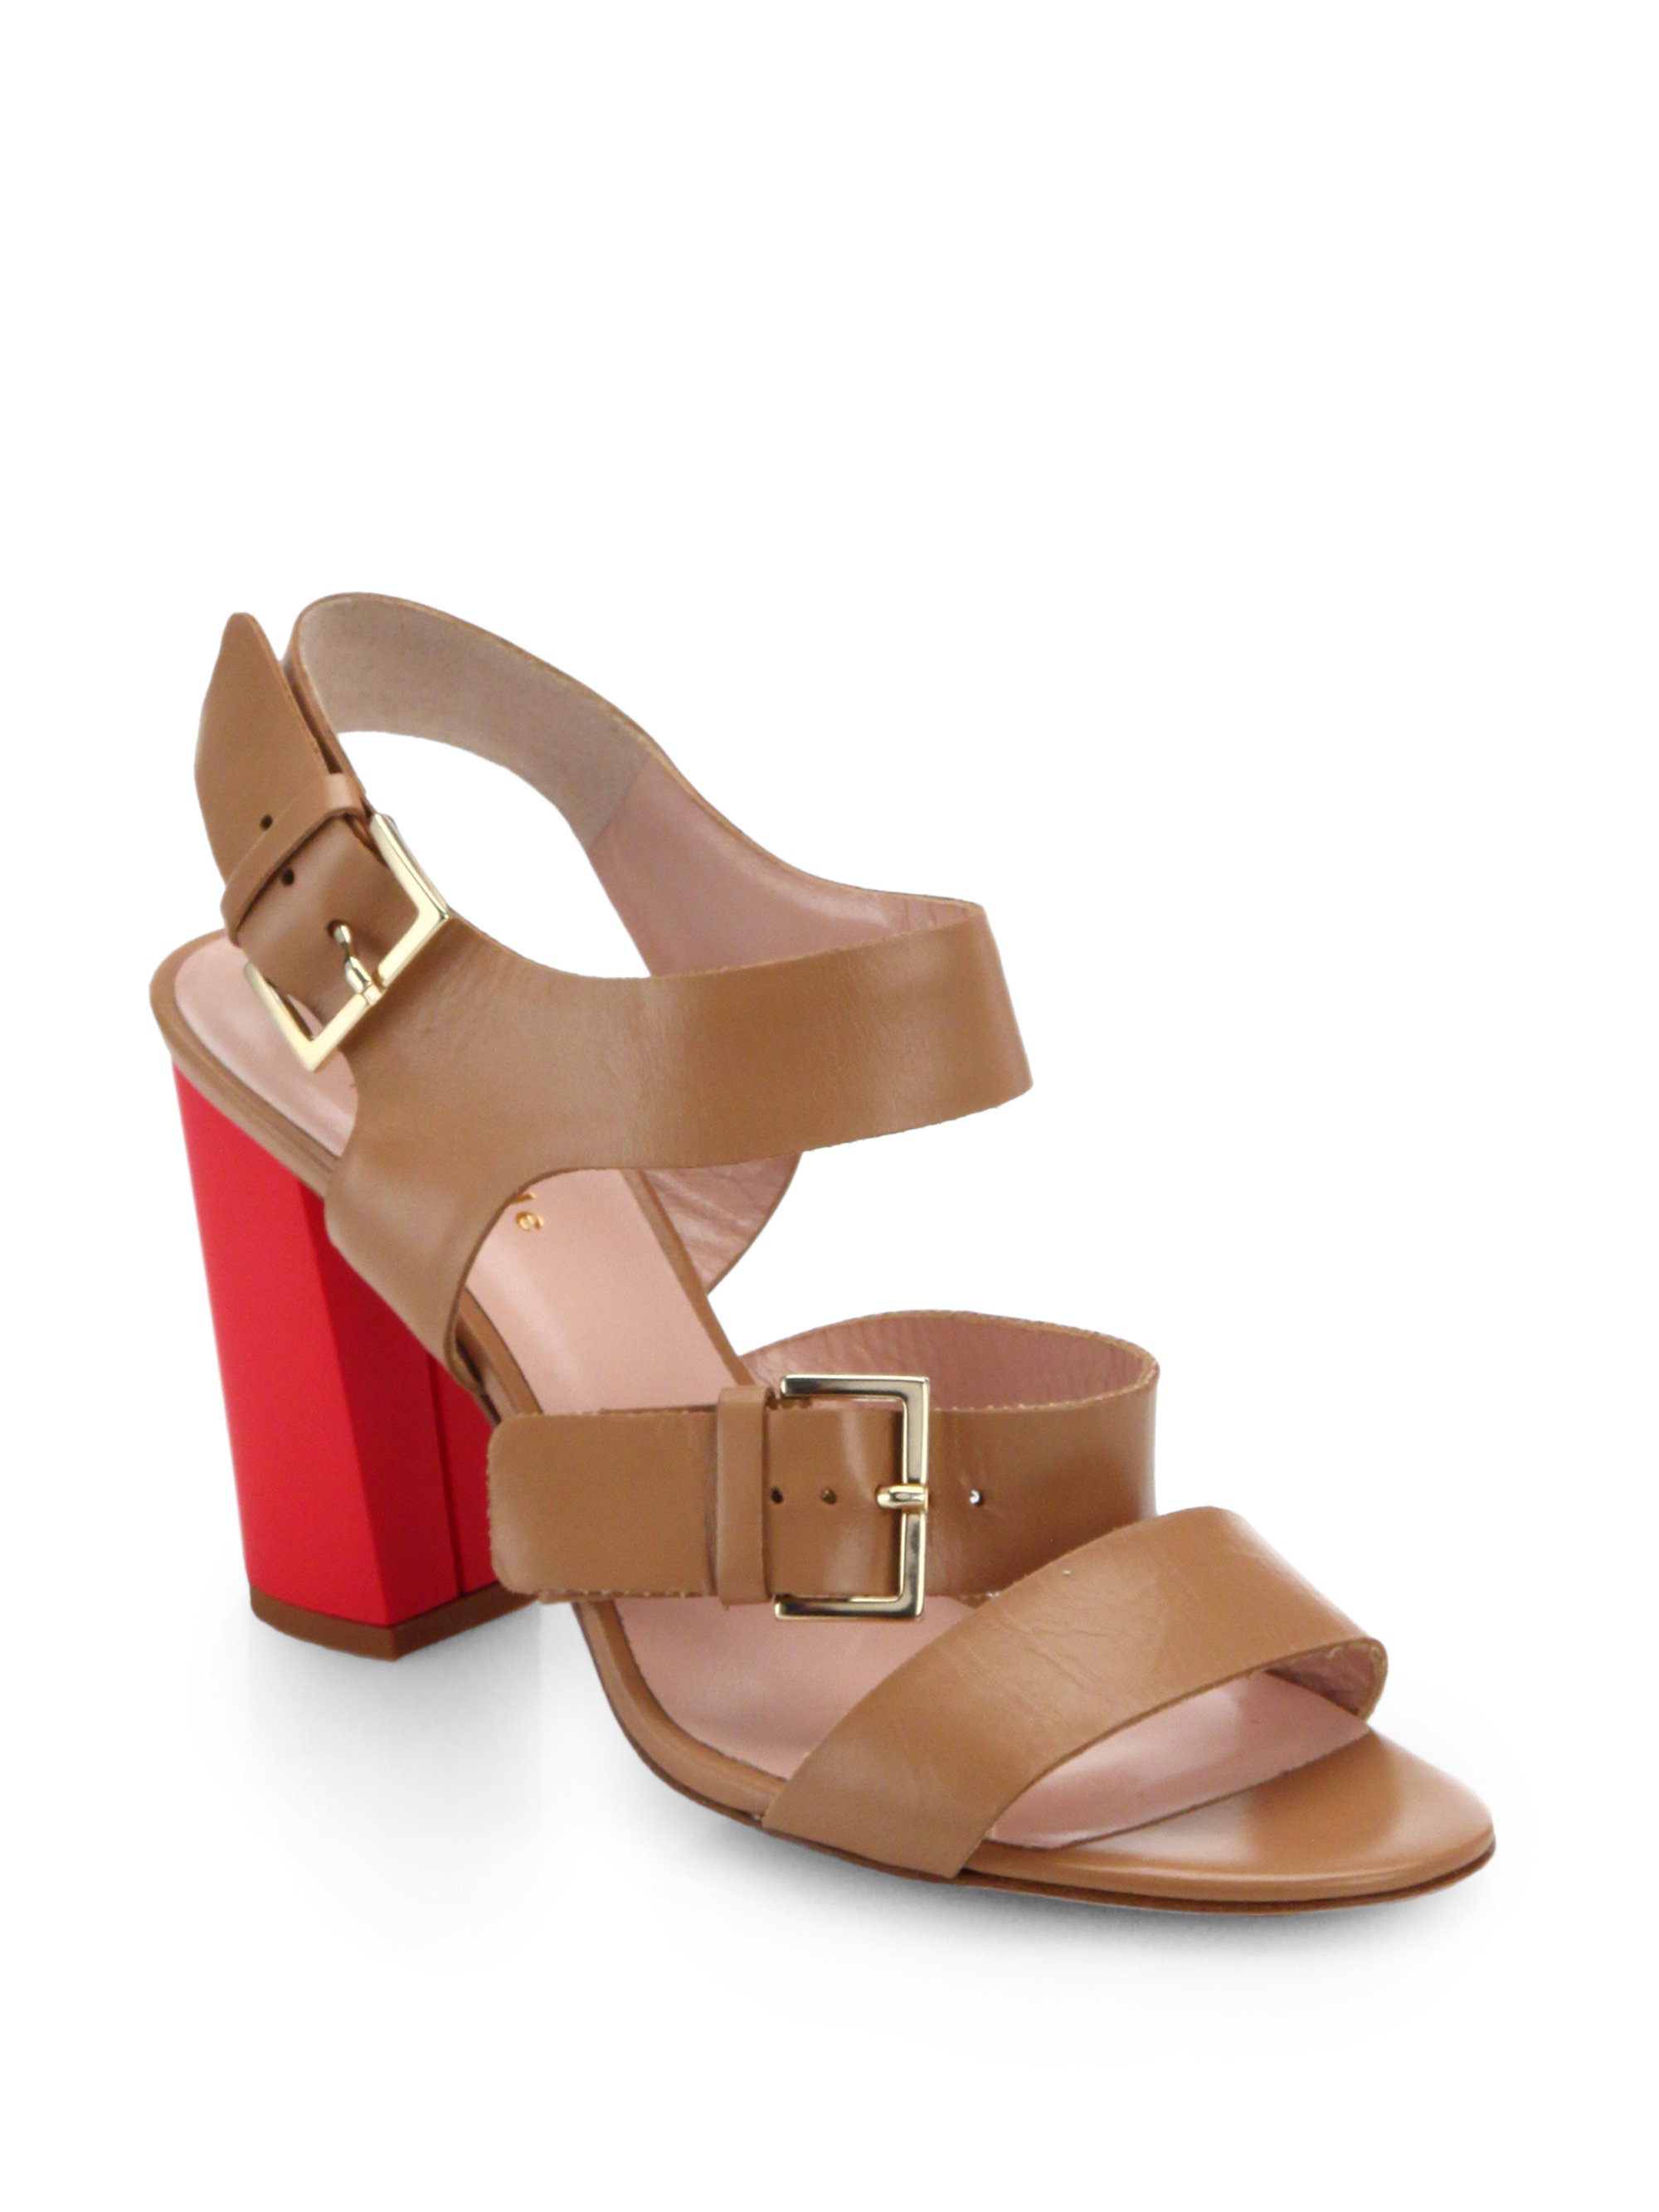 Kate Spade New York Orson Block-Heel Sandals U9nRm